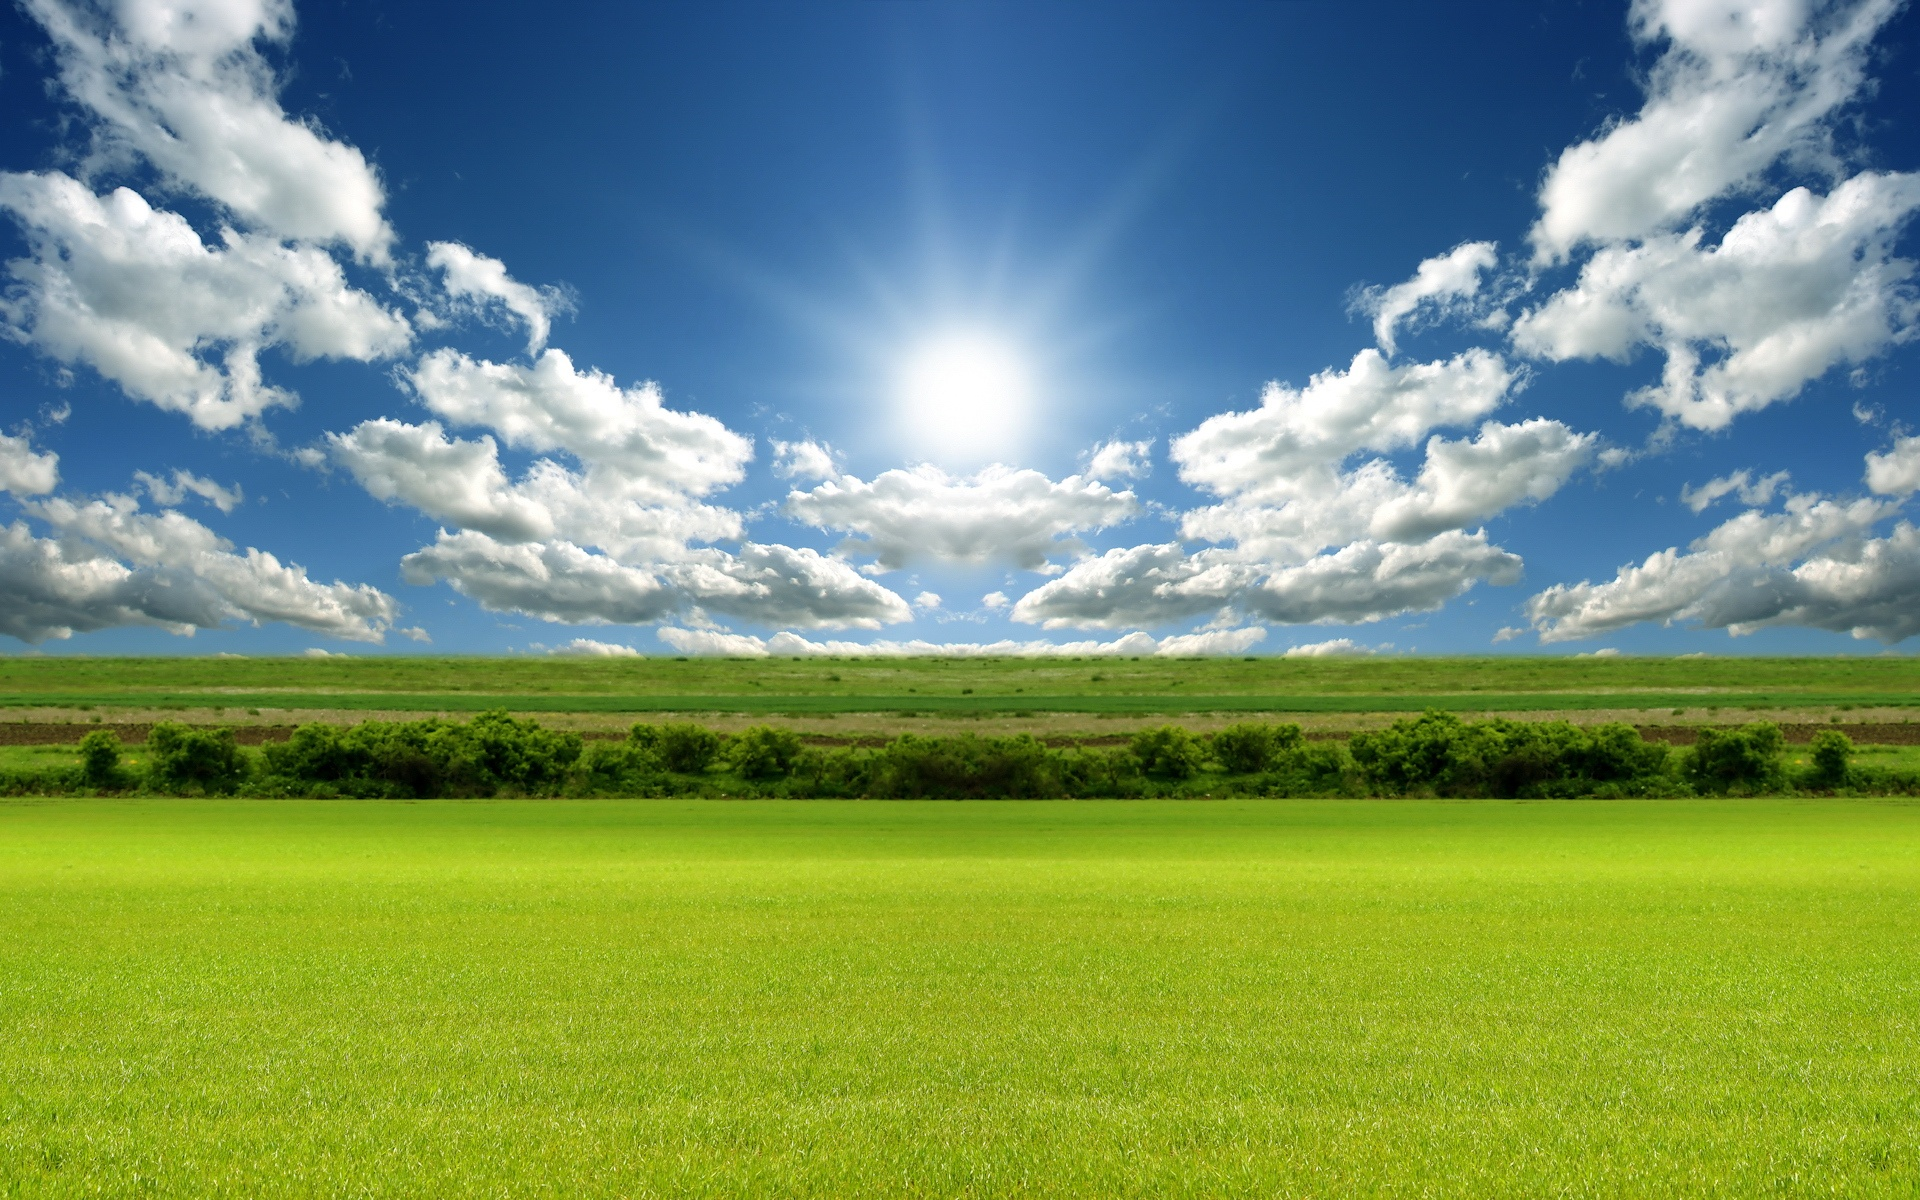 Nature_Fields_Green_field_under_blue_sky_016242_